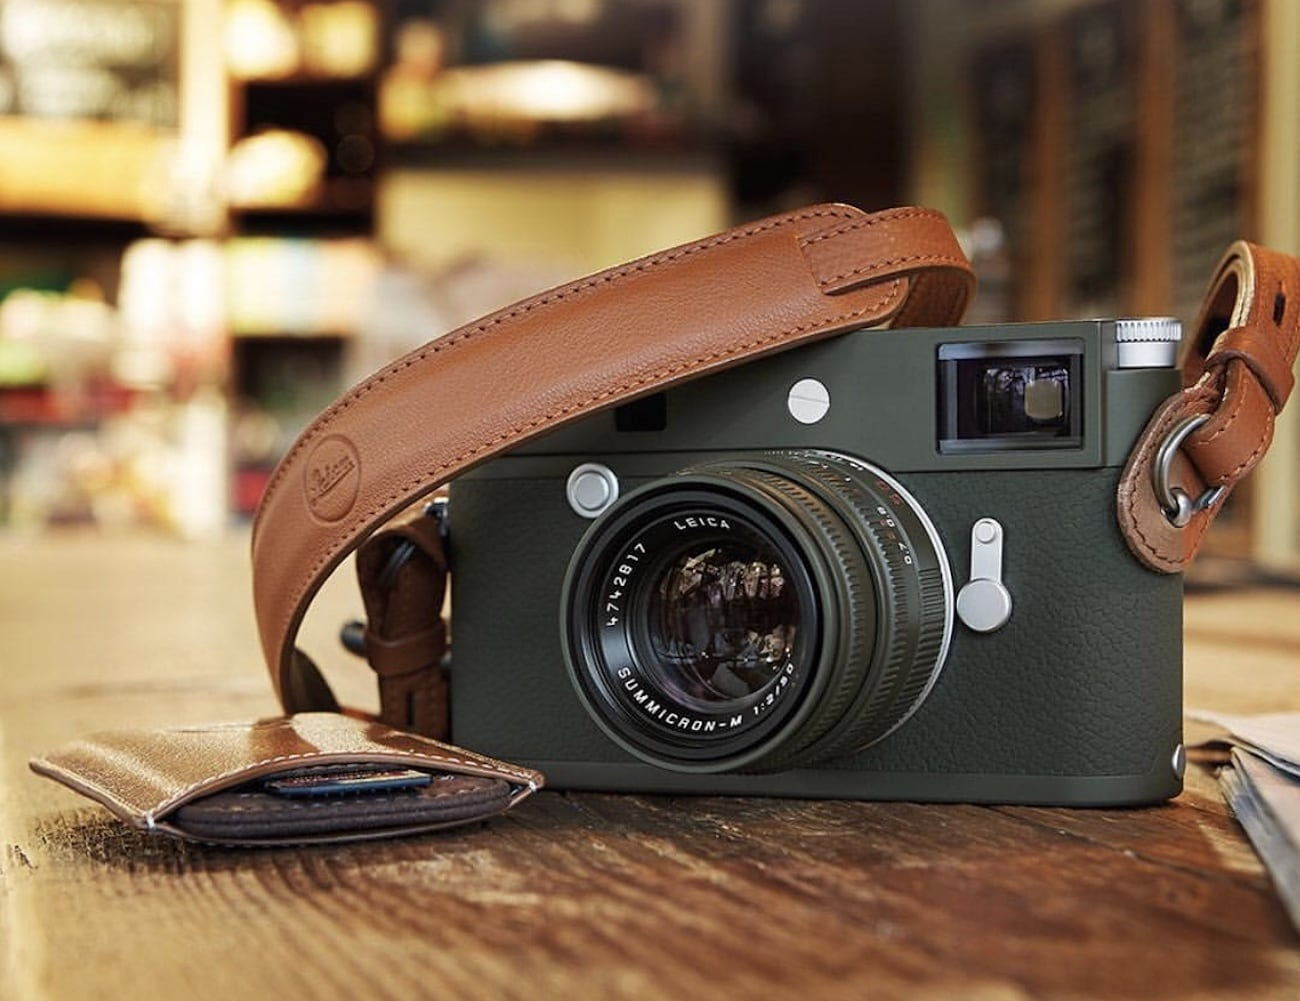 Leica M10-P Safari Limited Edition Camera